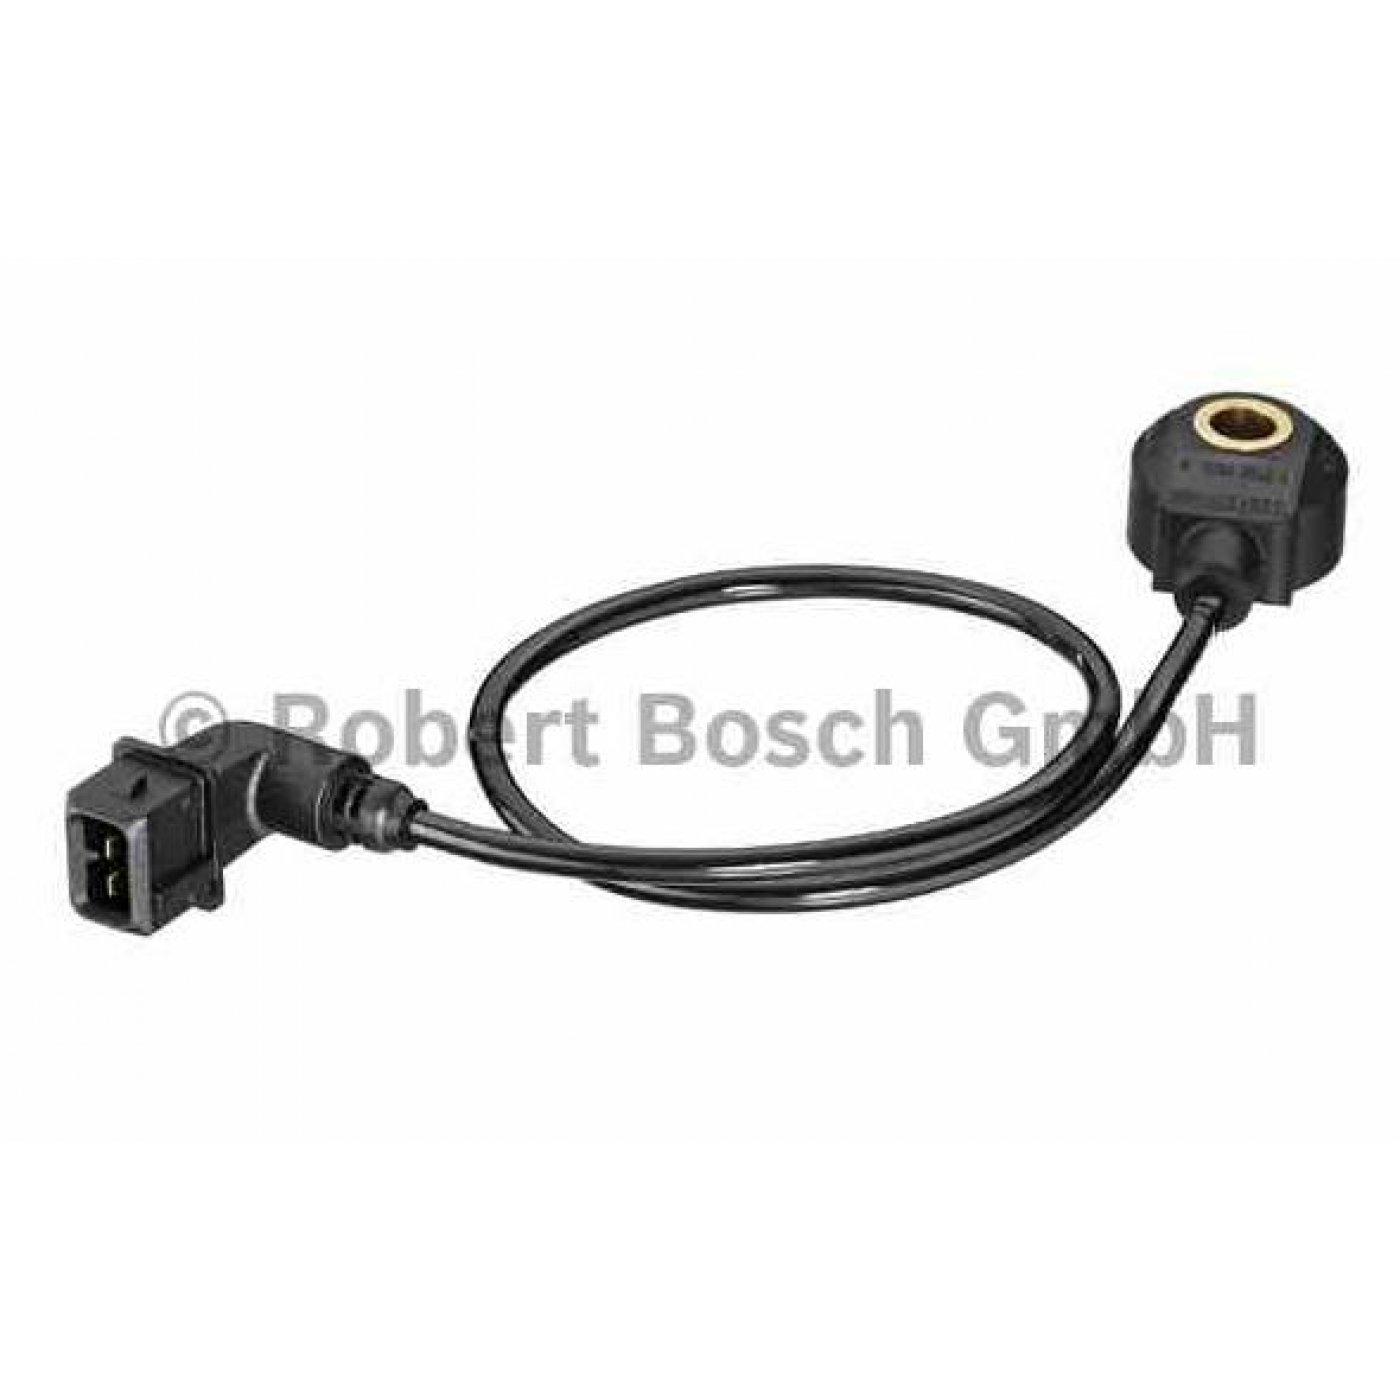 Bosch Klopfsensor Fur Bmw E36 E34 M40 M43